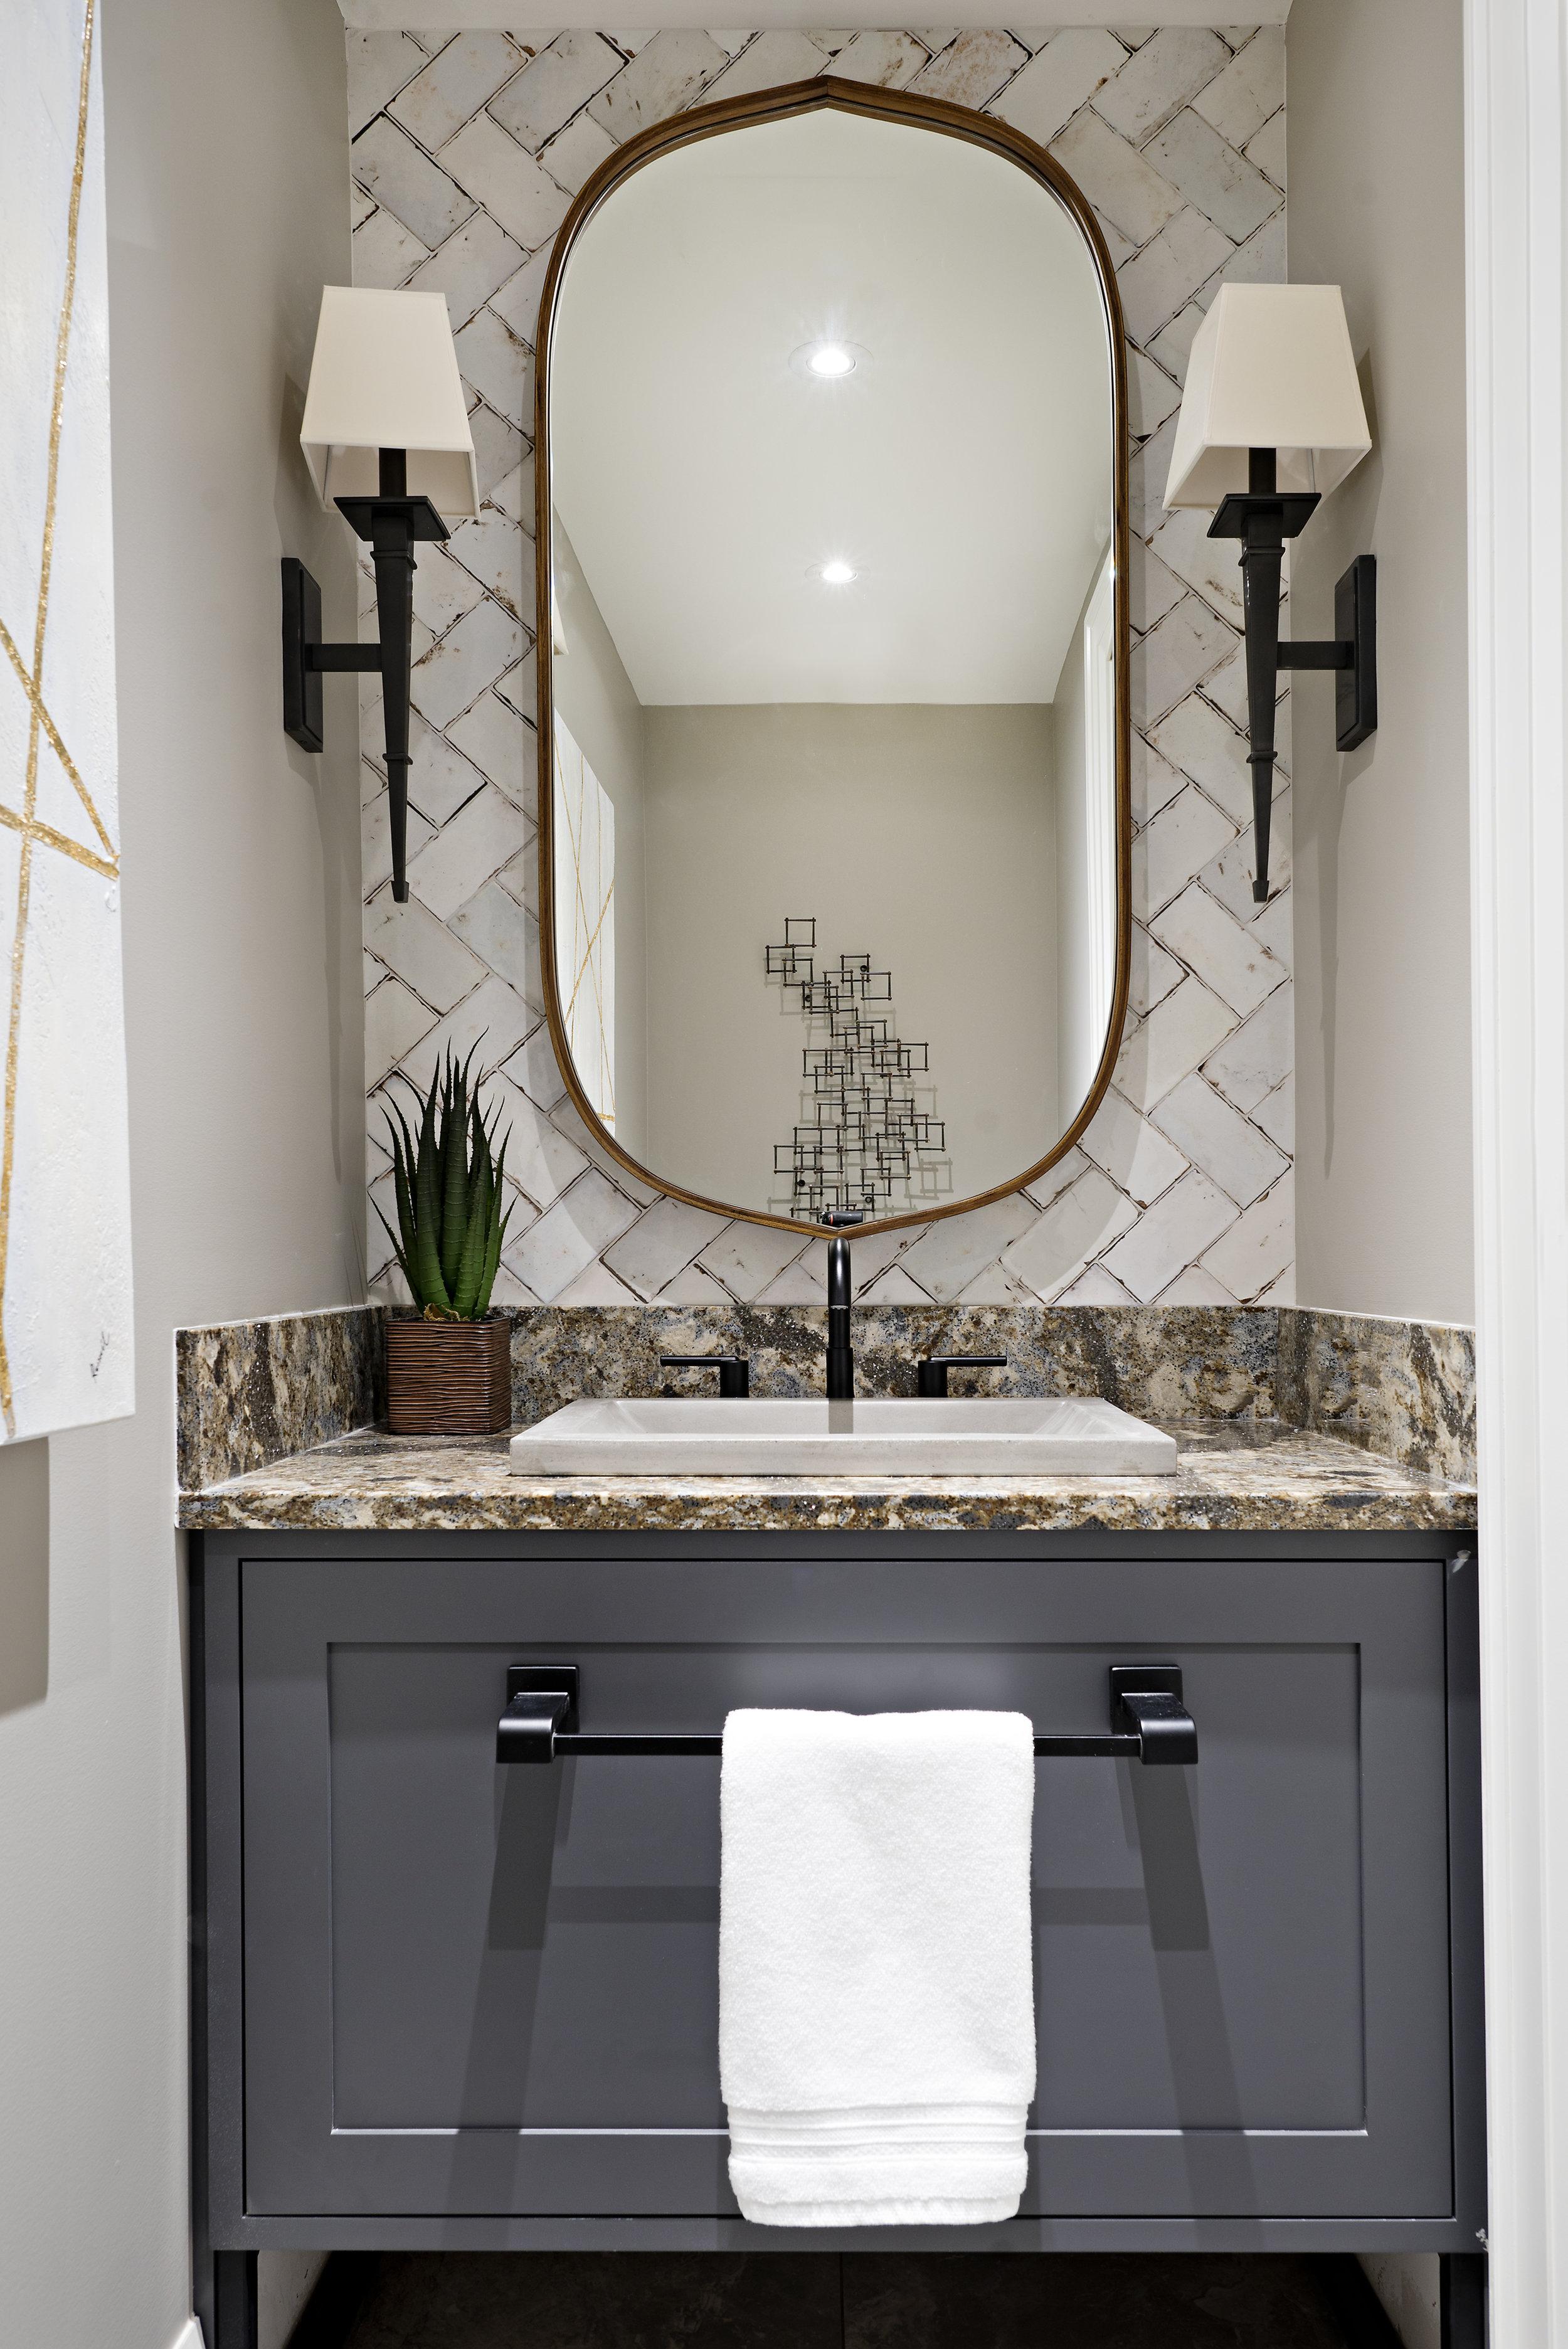 Interior Designer Pizzale Design Bright Powder Room Vanity Design Navy Cabinet.jpg